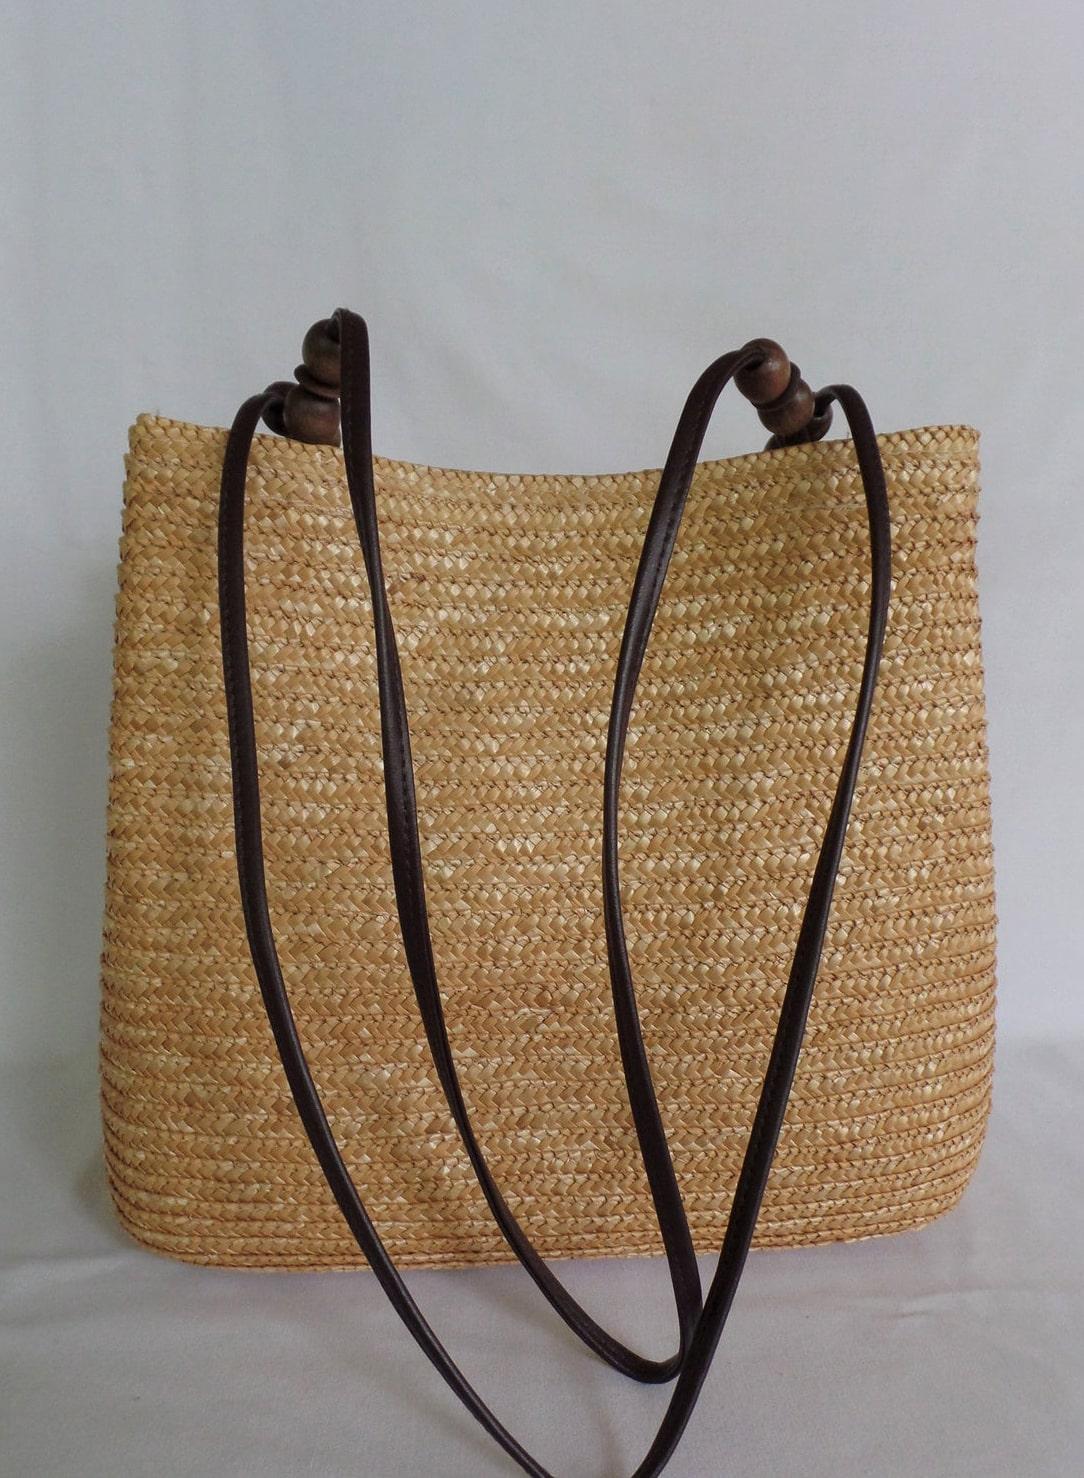 Vintage Woven Natural Straw Bucket Shoulder Bag Purse Handbag